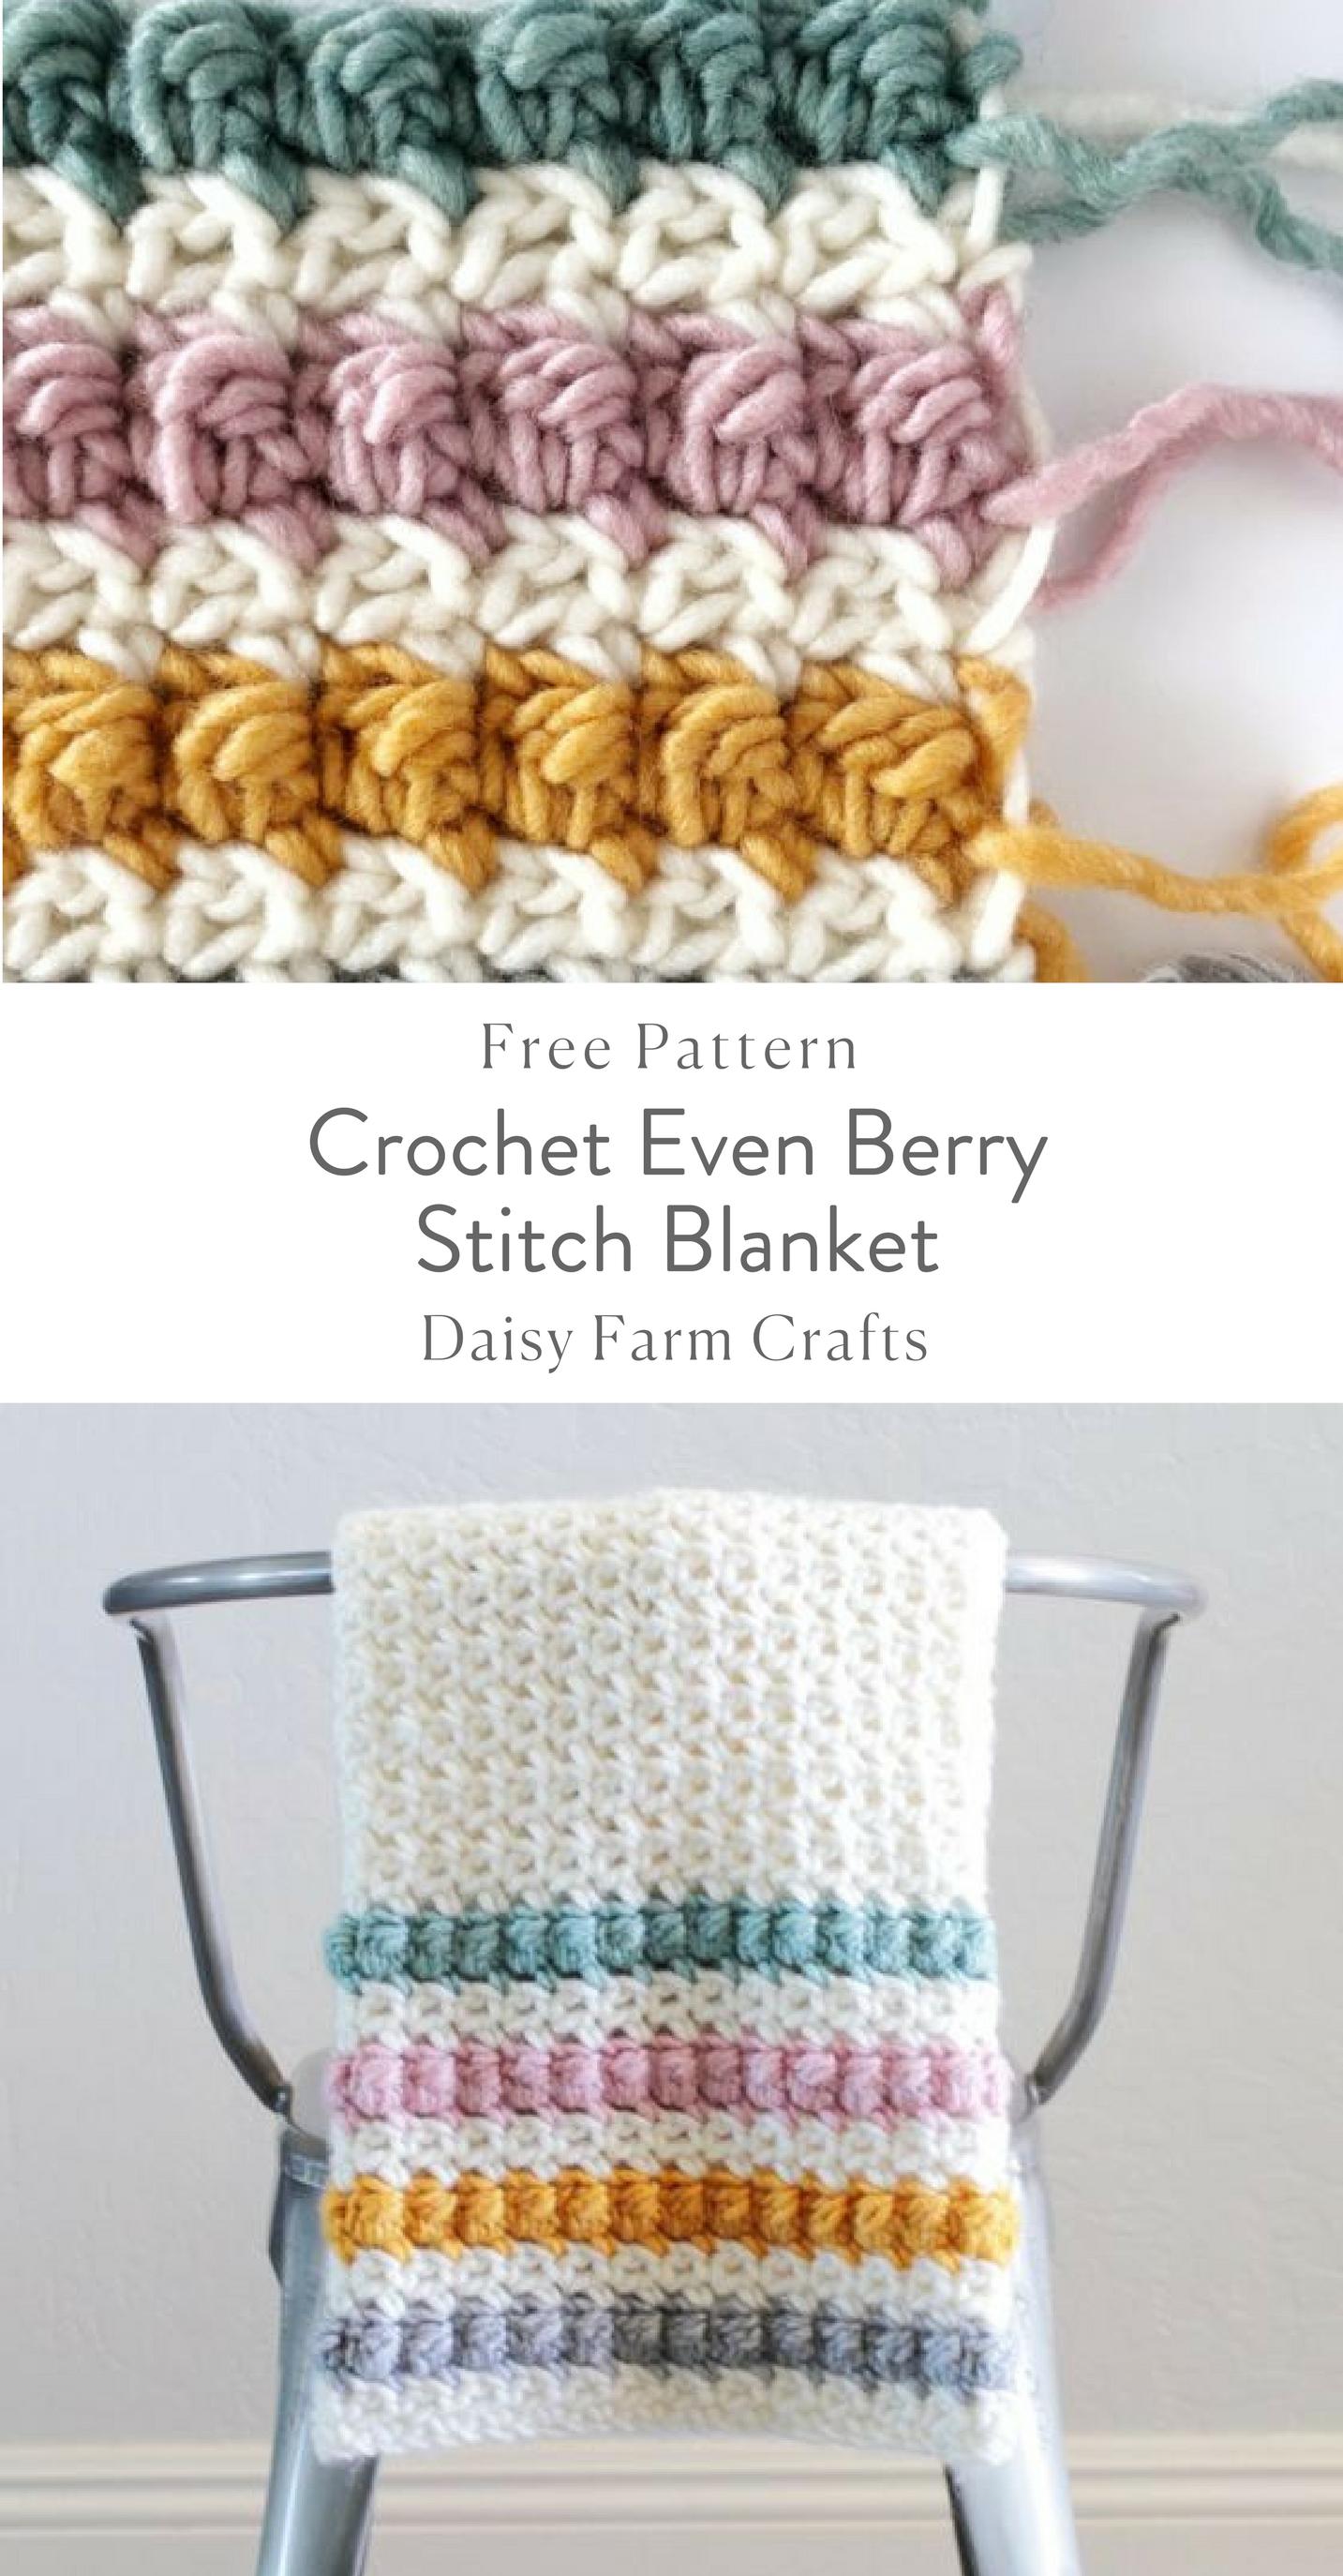 Crochet Even Berry Stitch Blanket - Free Pattern | Crochet | Pinterest